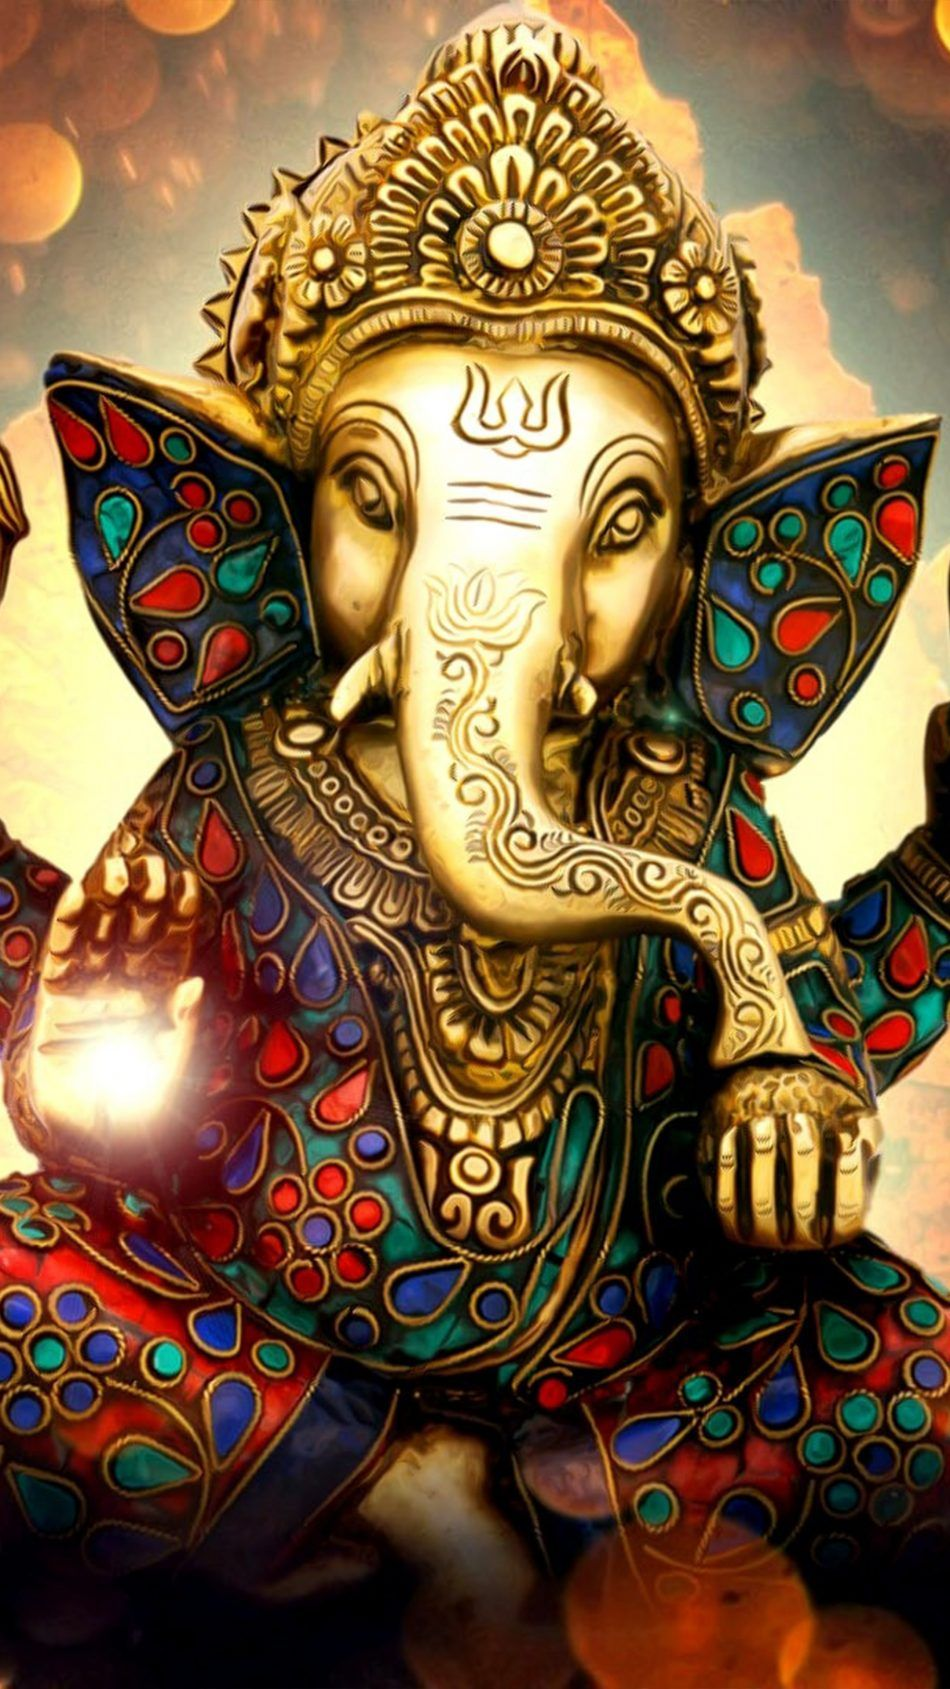 Lord Ganesha Ganapati Statue Idol 4k Ultra Hd Mobile Wallpaper Ganesh Wallpaper Ganesha Pictures Lord Ganesha